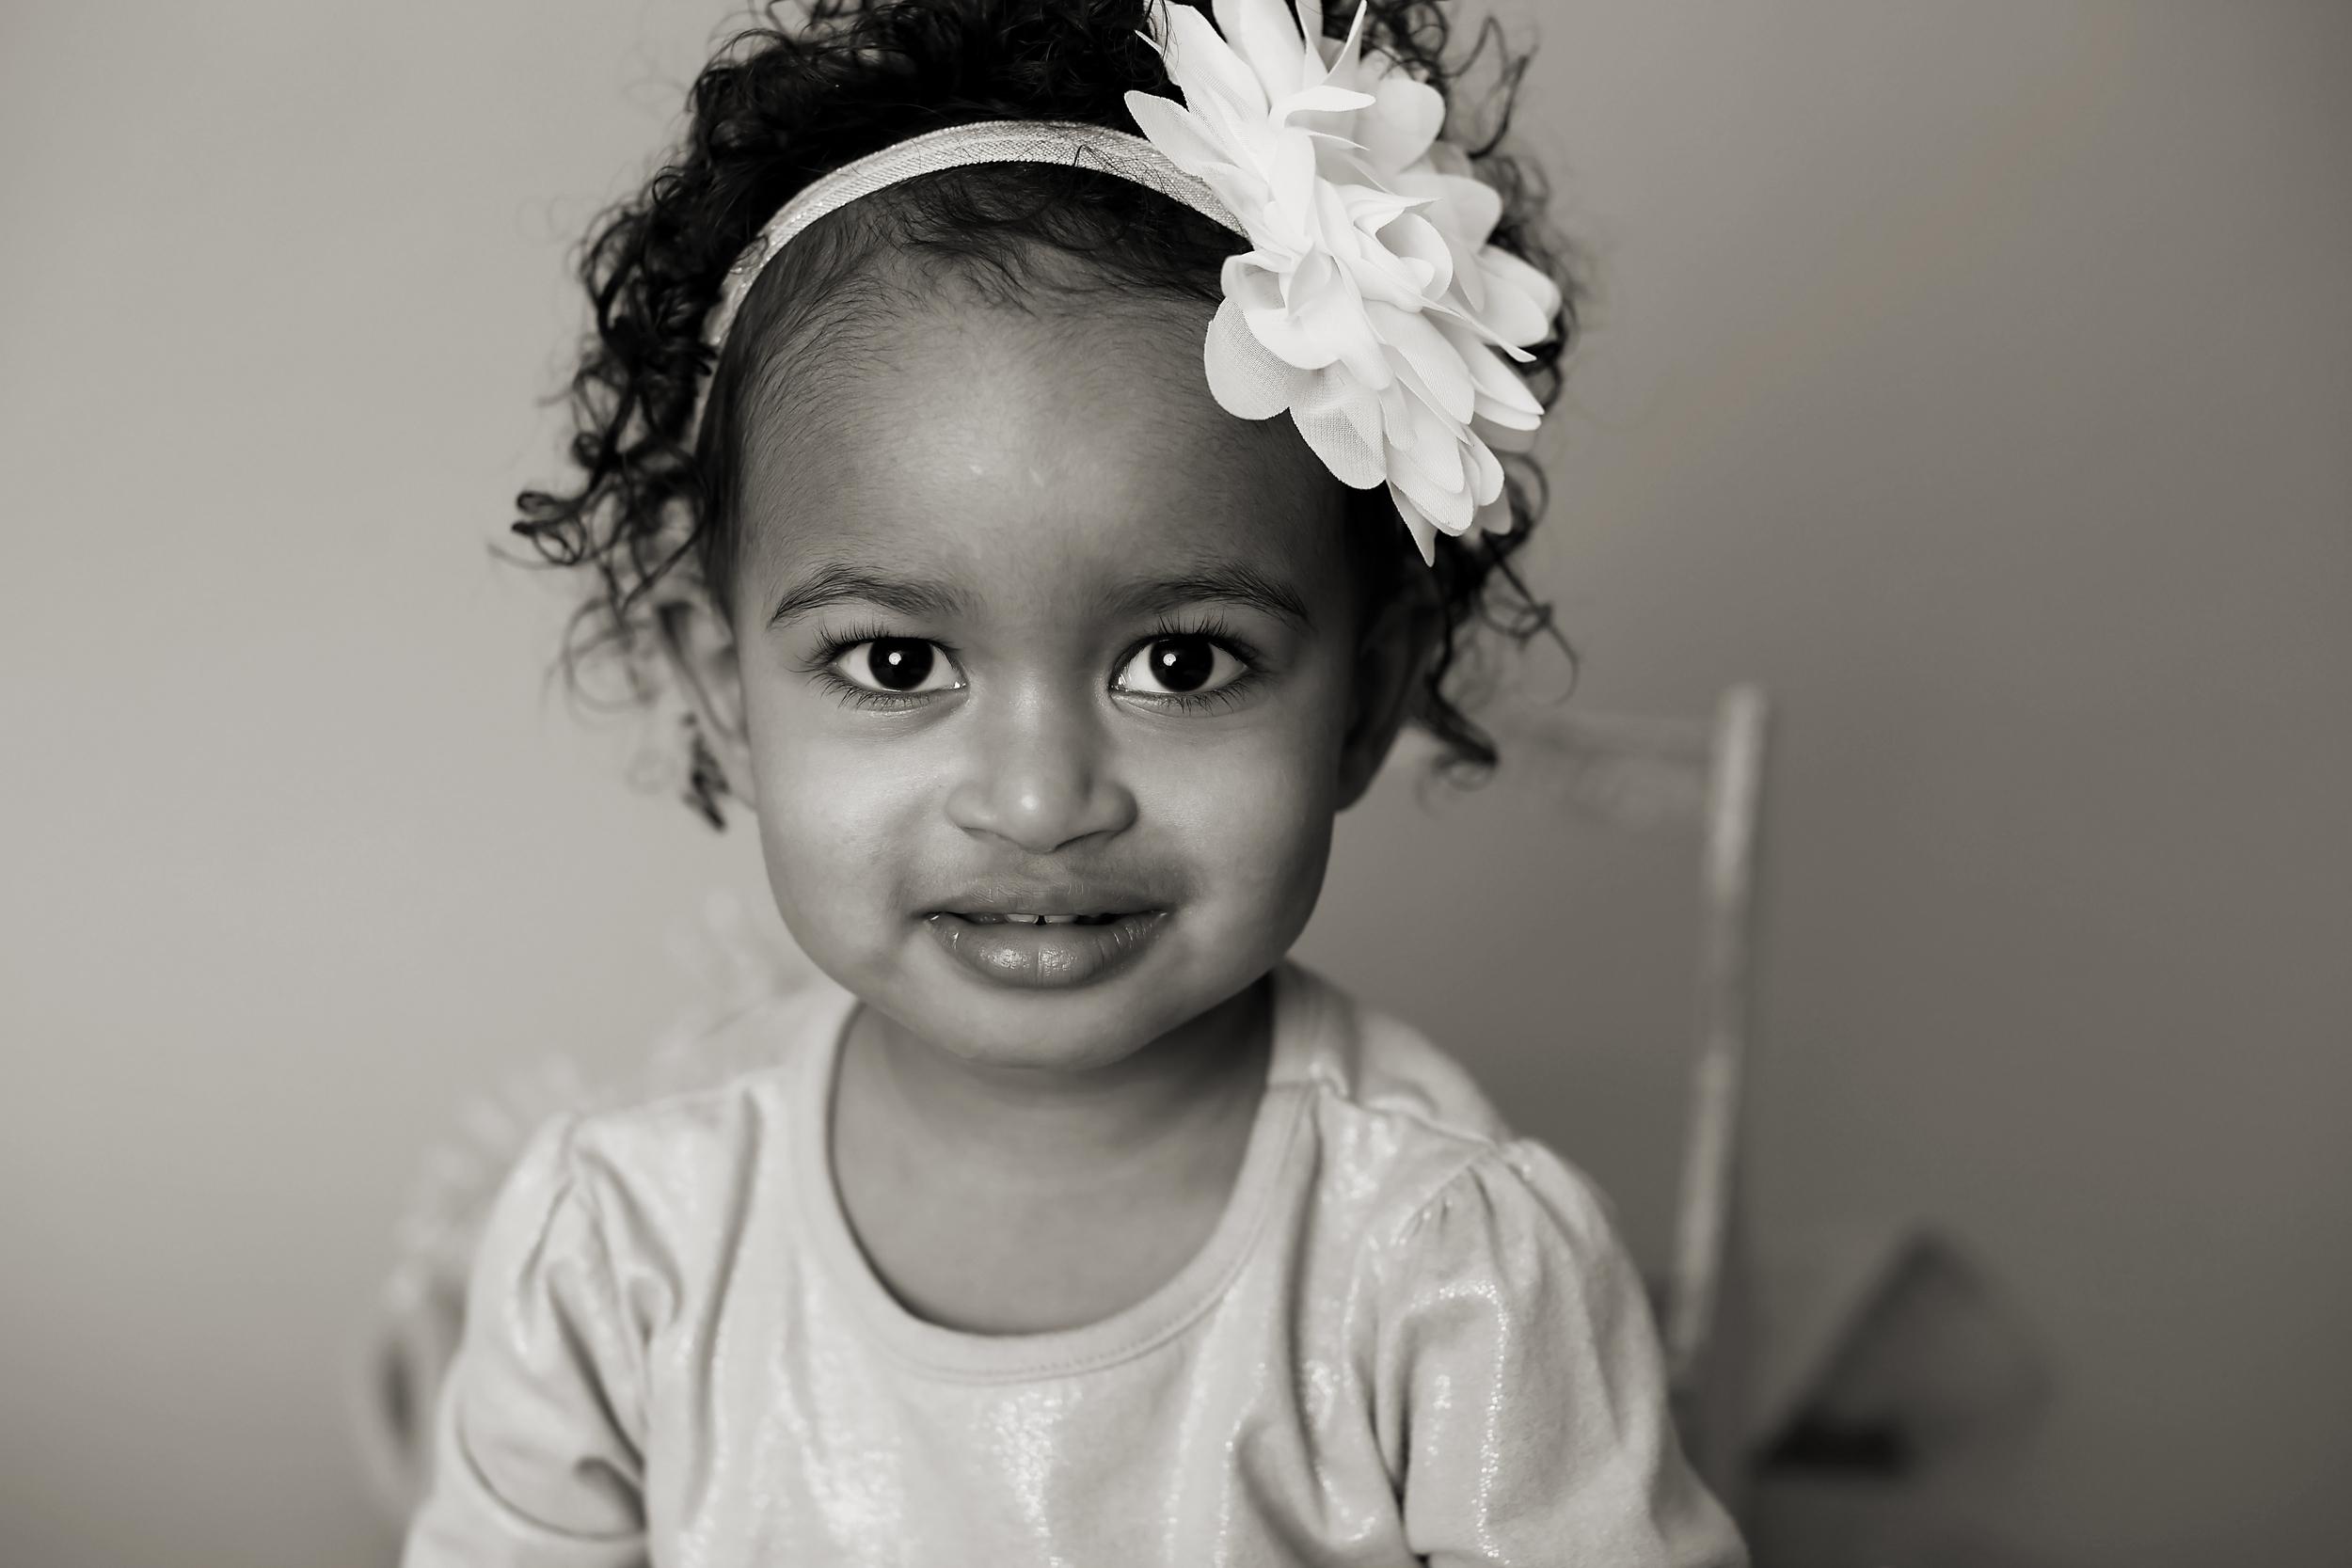 Worthington Child photographer, photography at studio in powell